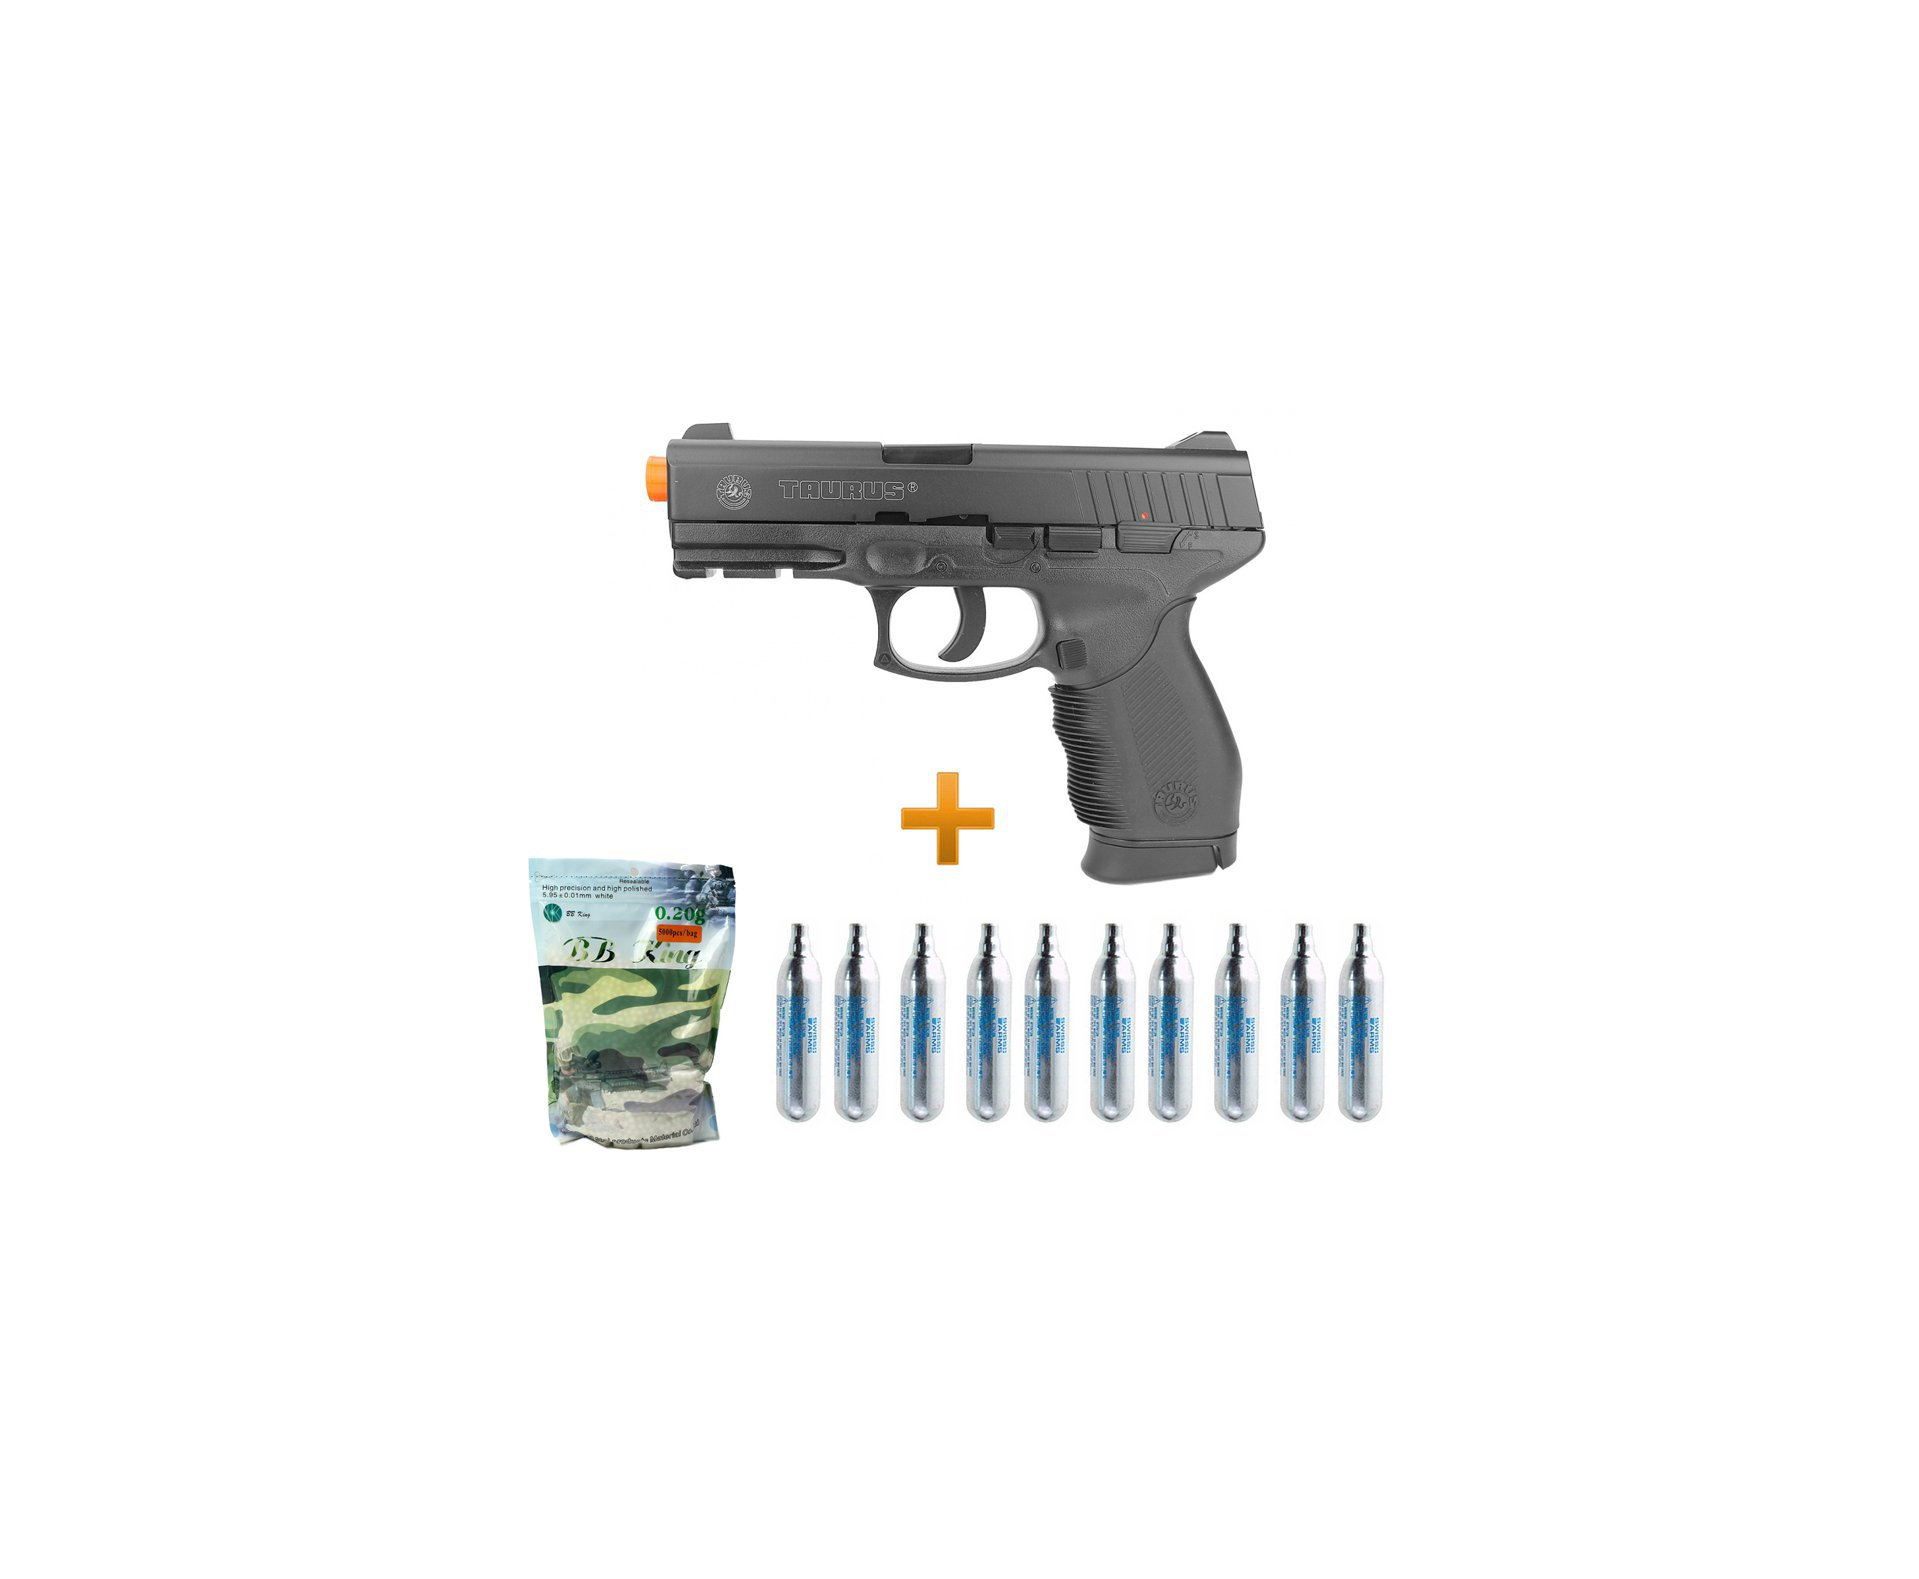 Pistola Airsoft Co2 Taurus 24/7 Polímero 6,0 + 10 Cilindros + 4000 Bbs